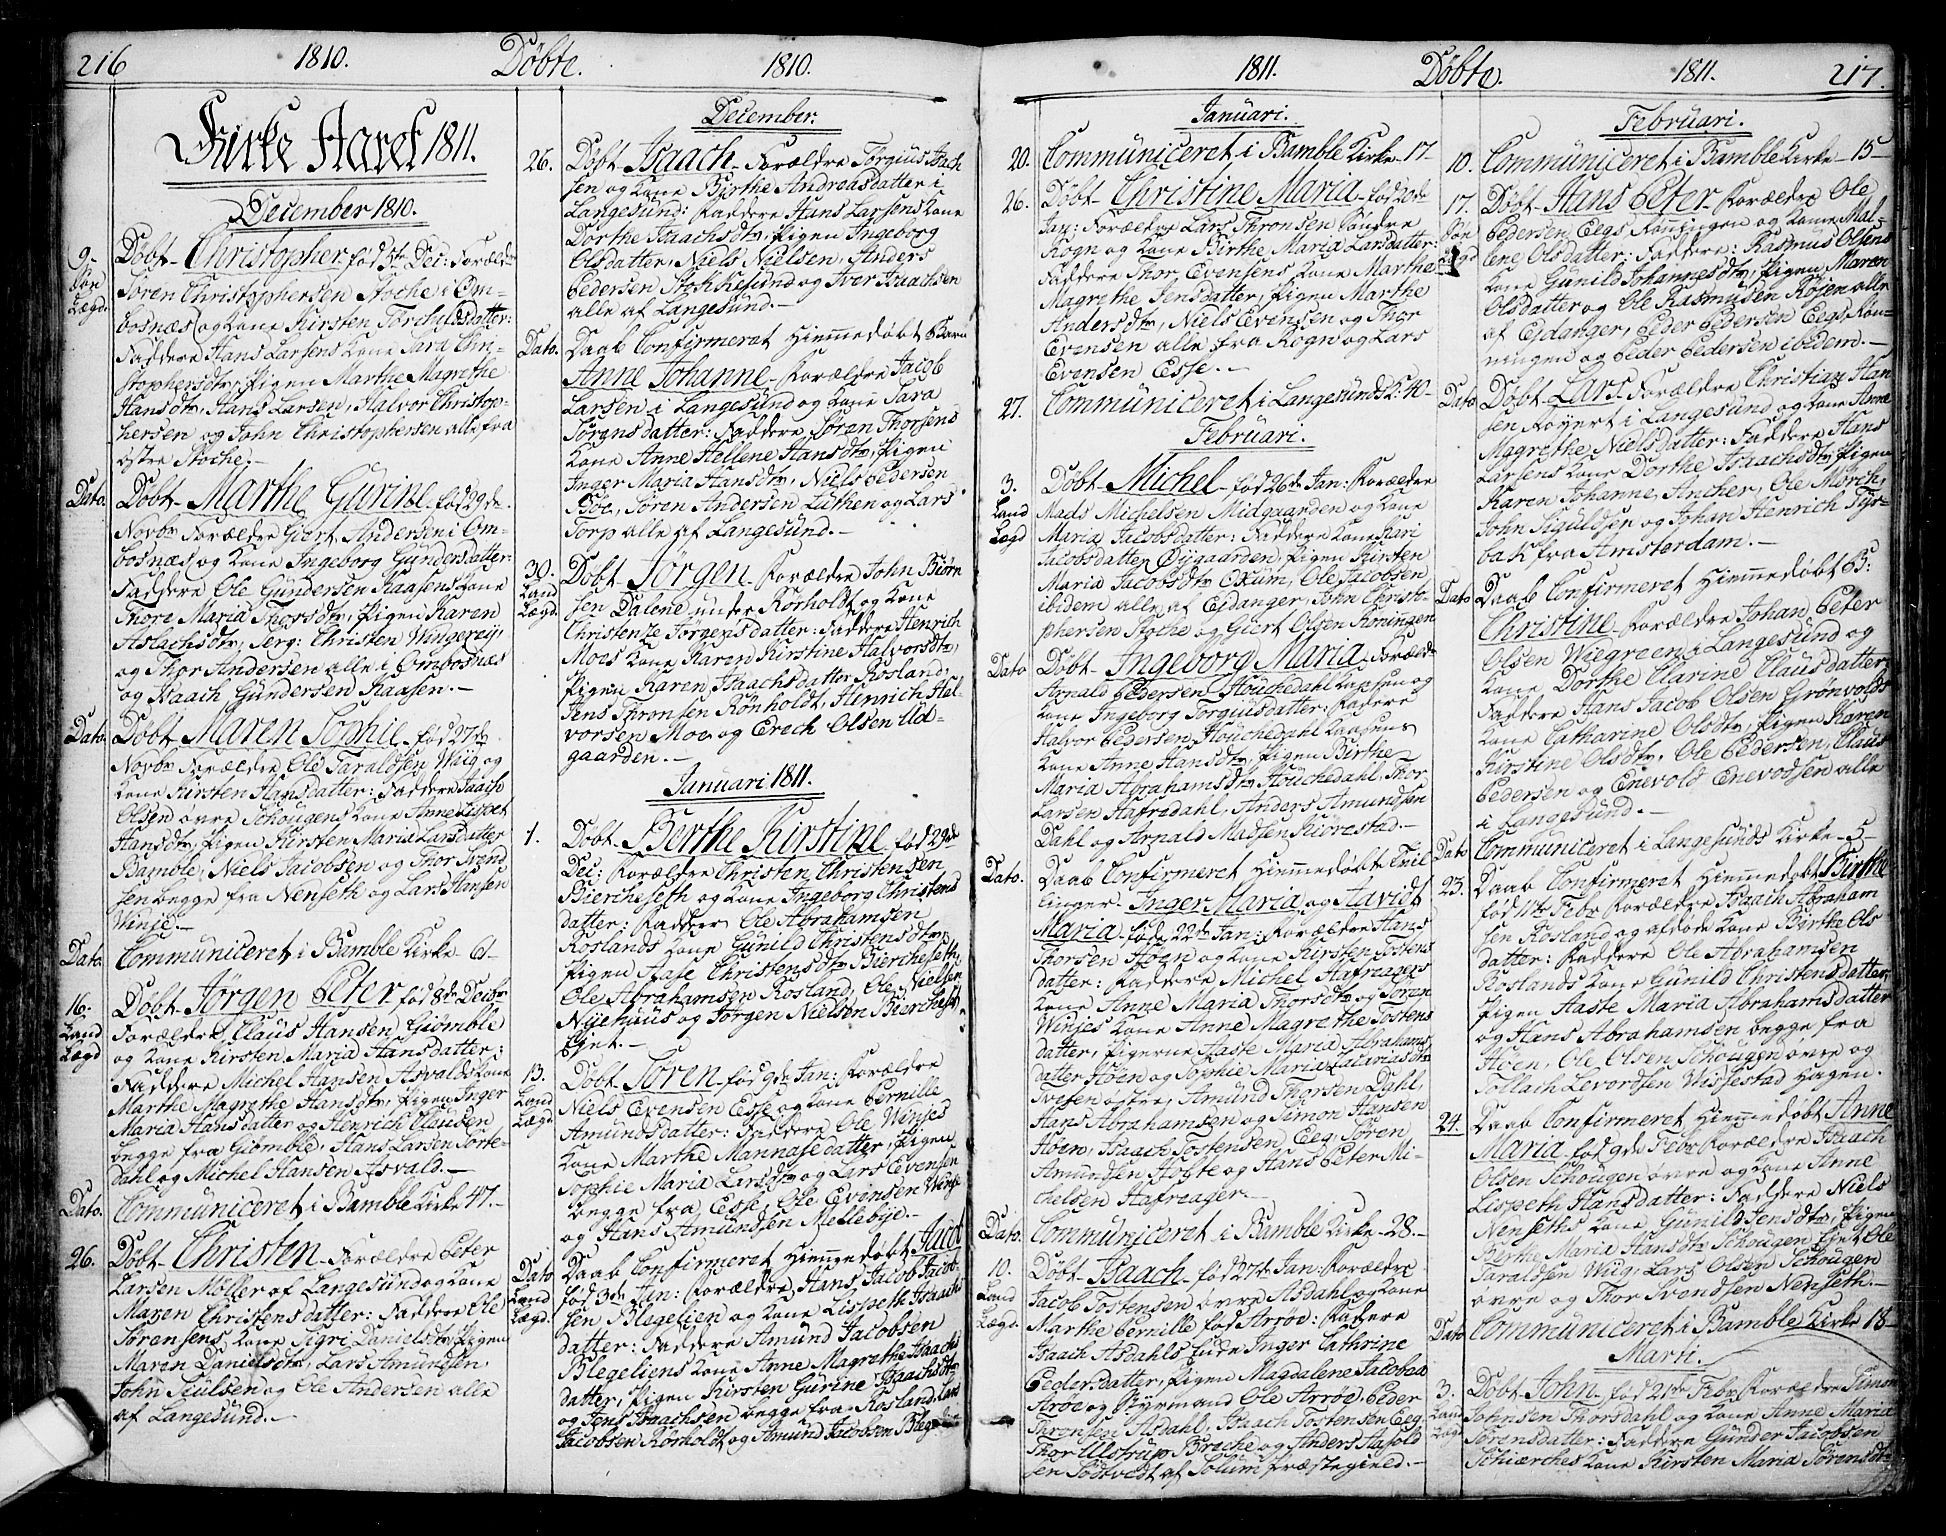 SAKO, Bamble kirkebøker, F/Fa/L0002: Ministerialbok nr. I 2, 1775-1814, s. 216-217